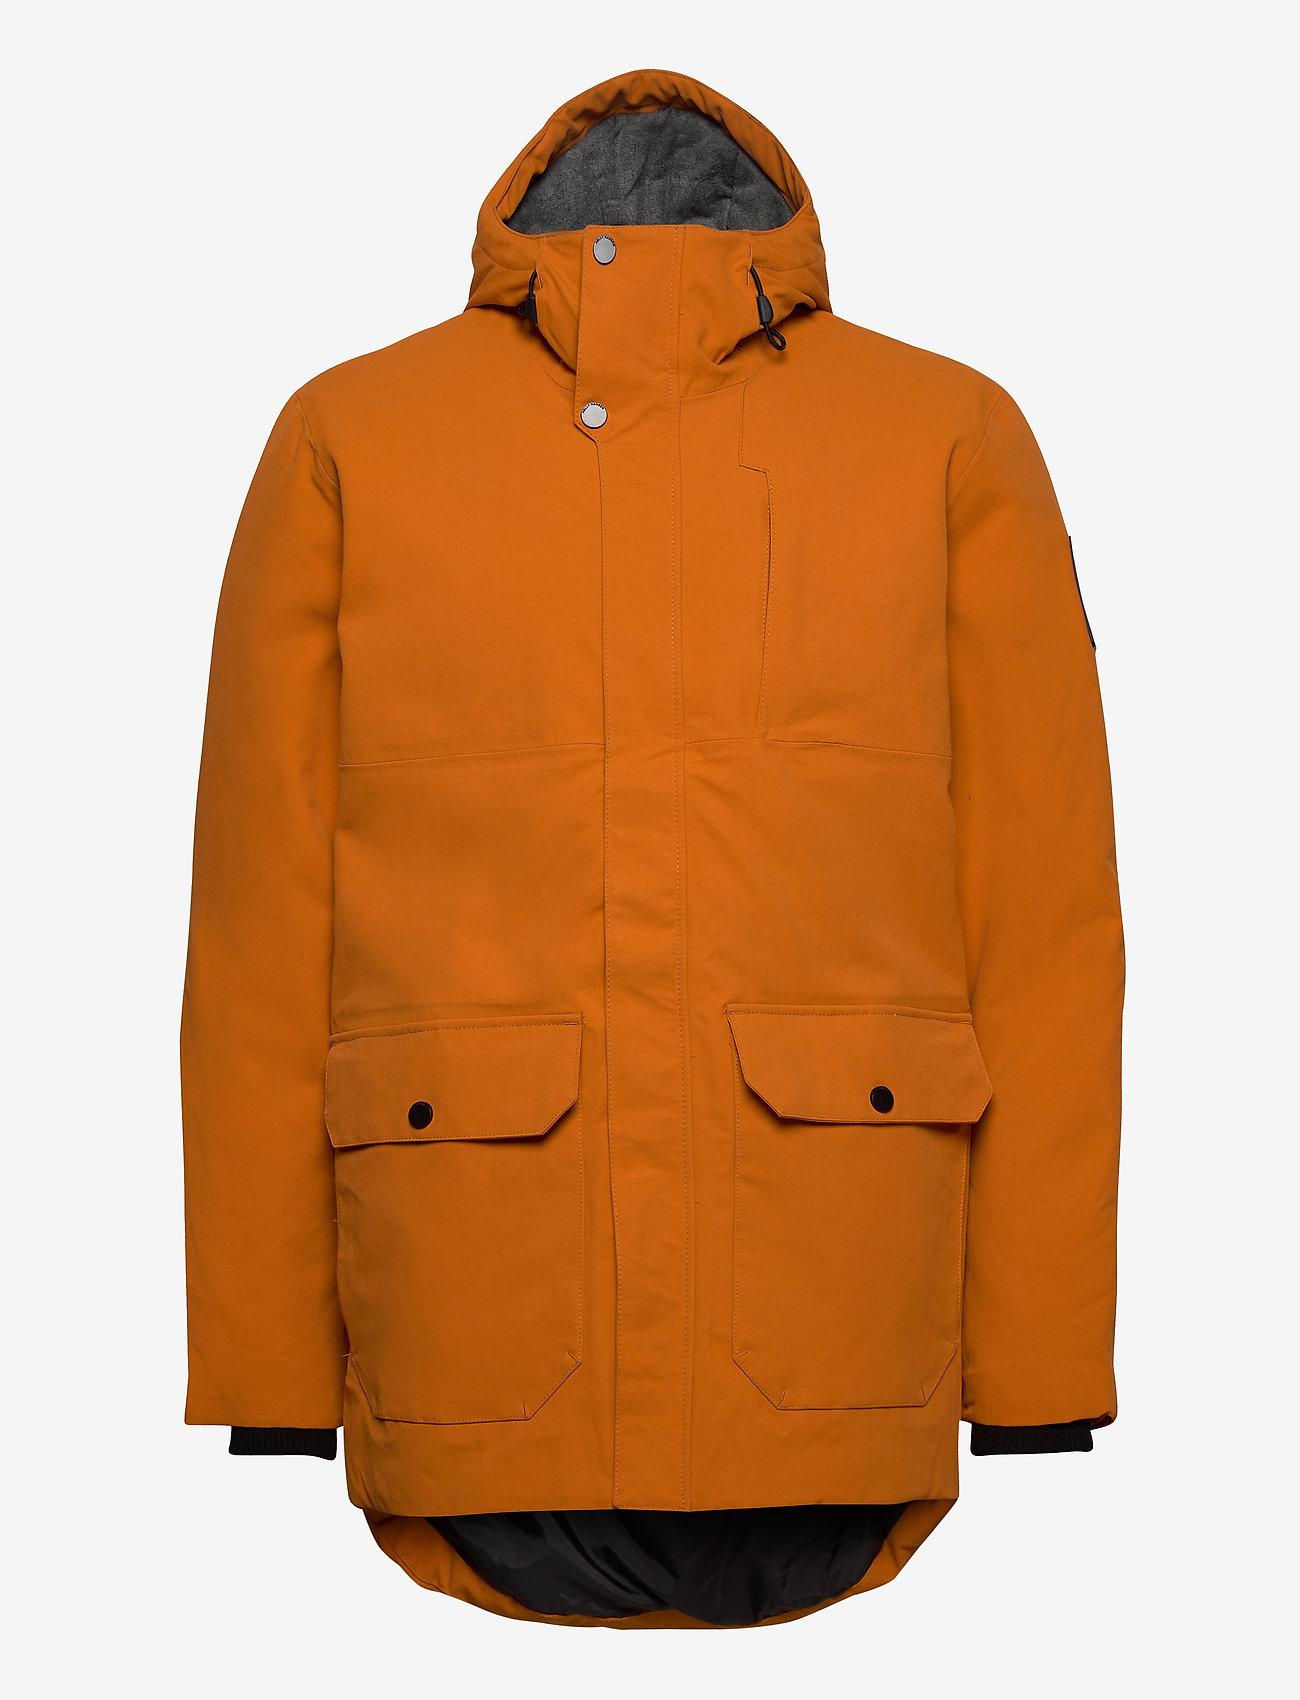 Helly Hansen - URBAN LONG JACKET - insulated jackets - marmalade - 1